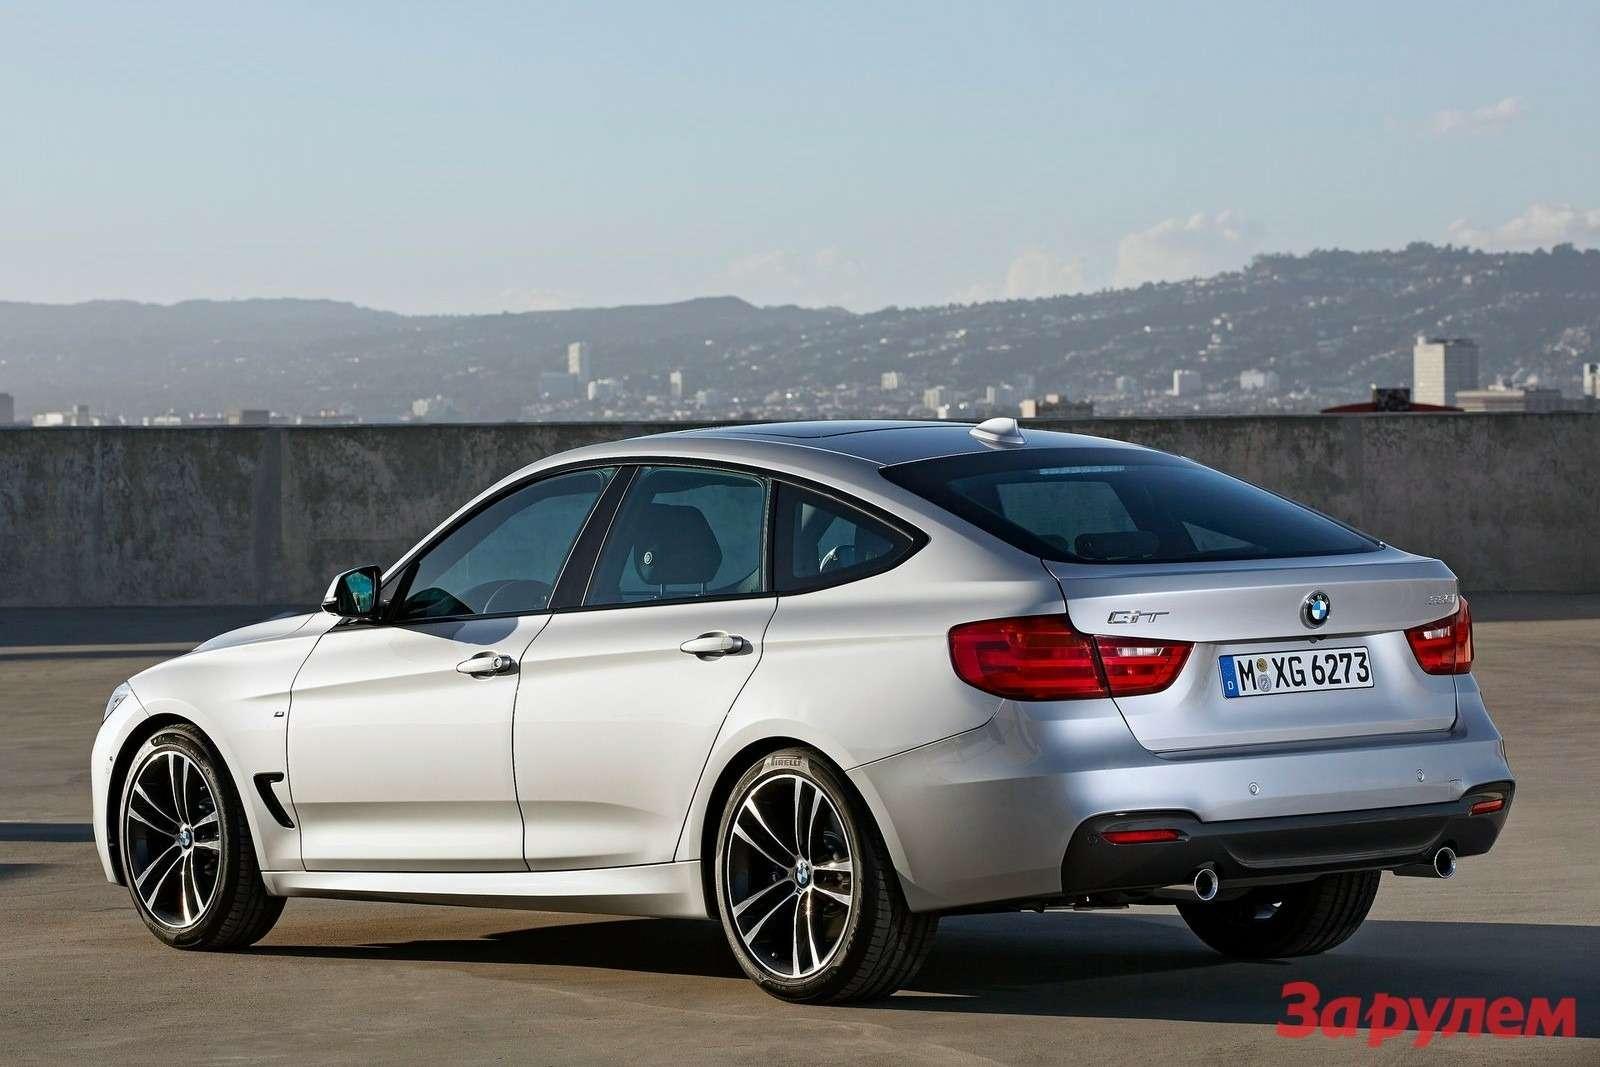 BMW-3-Series_Gran_Turismo_2014_1600x1200_wallpaper_22